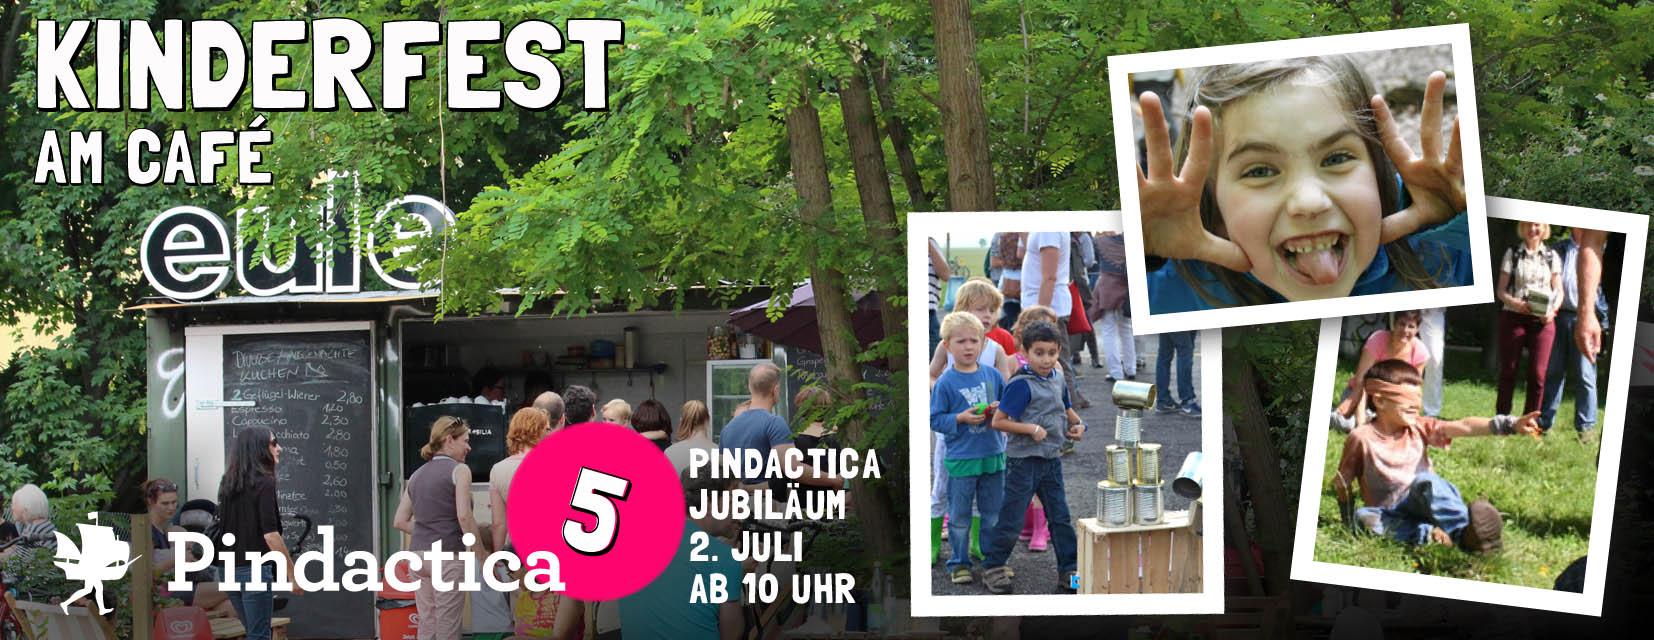 Kinderfest 5 Jahre Pindactica